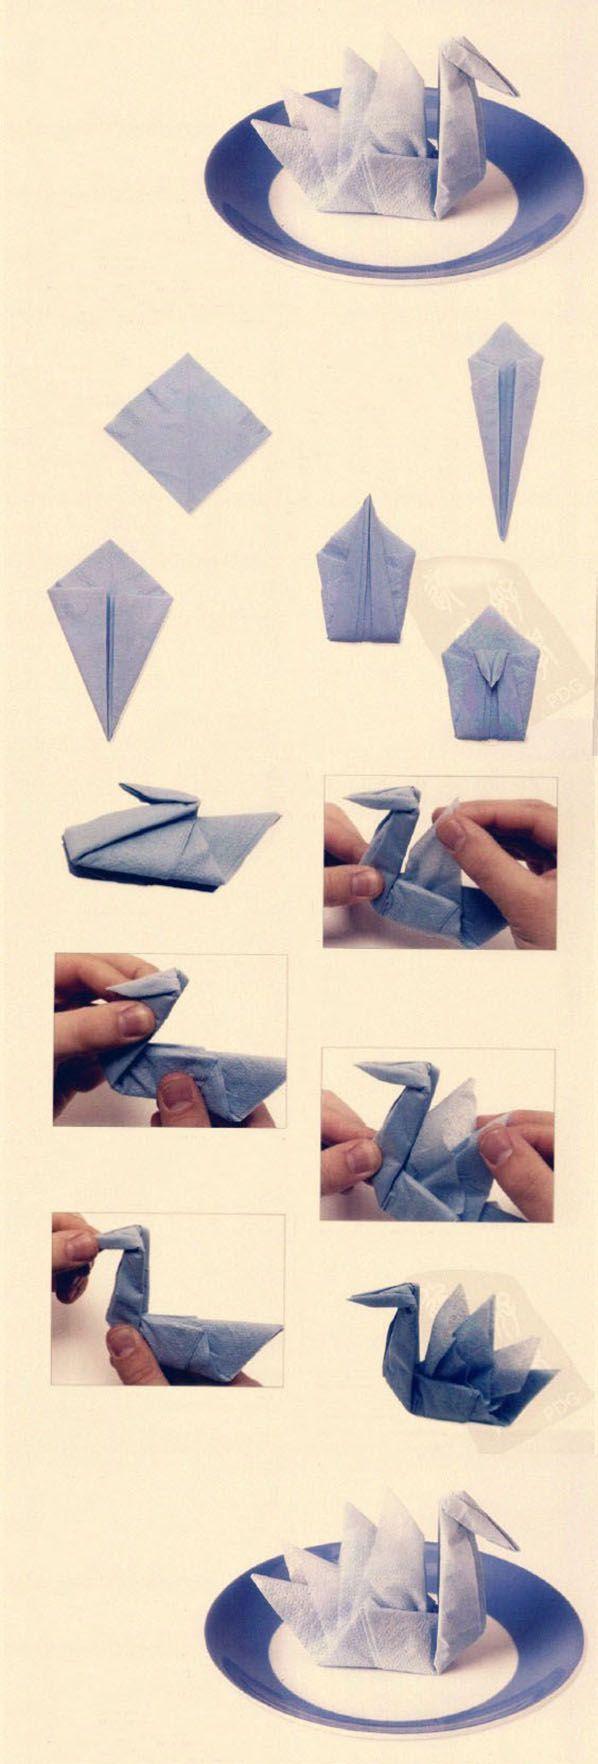 Origami Shirts => https://www.sunfrog.com/JohnyD/origami